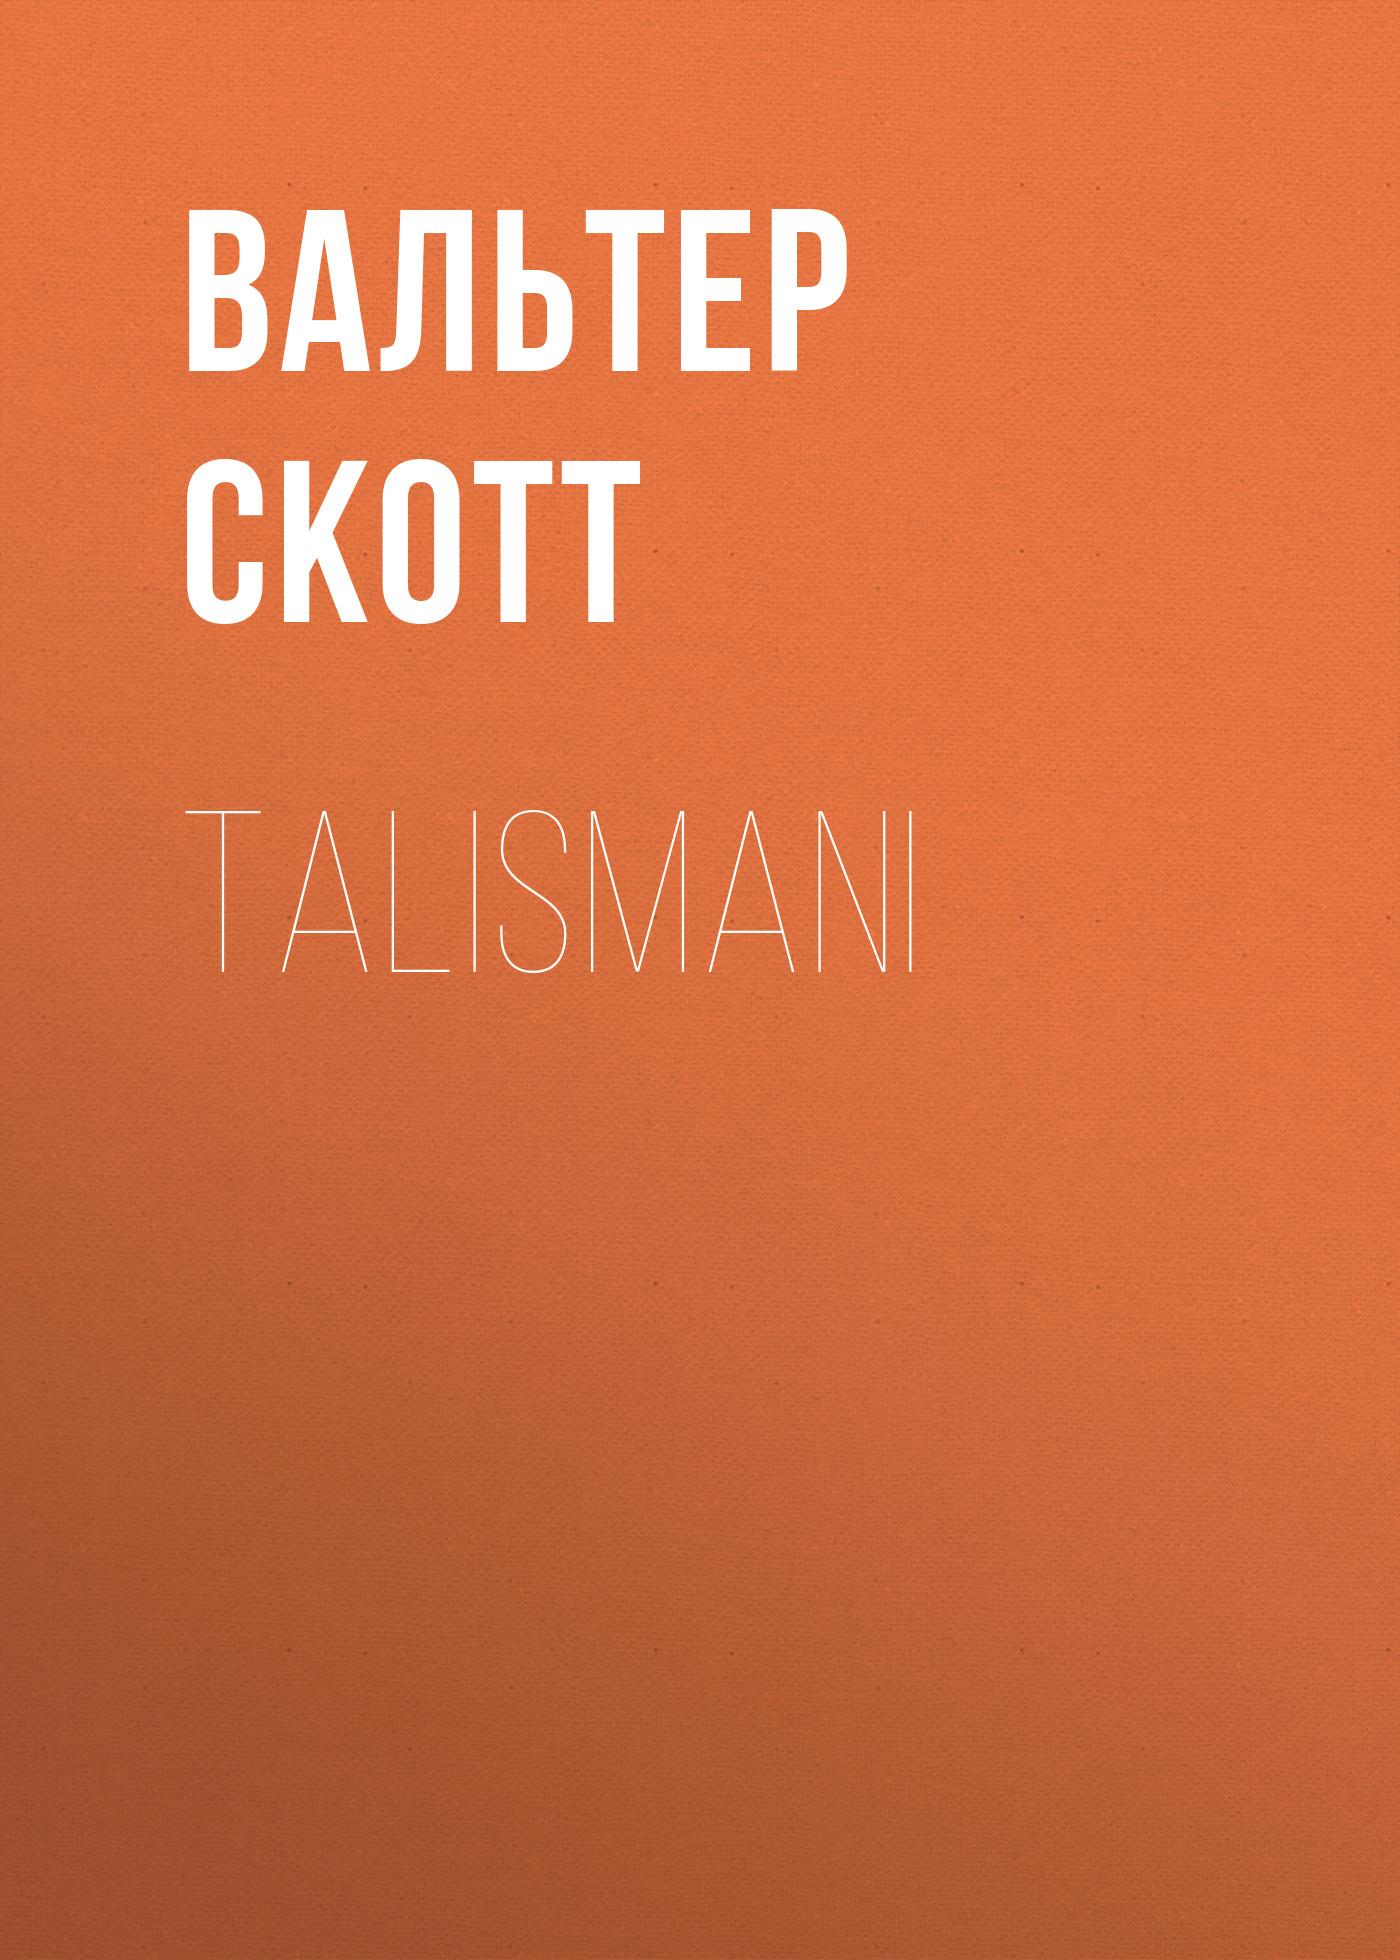 Вальтер Скотт Talismani